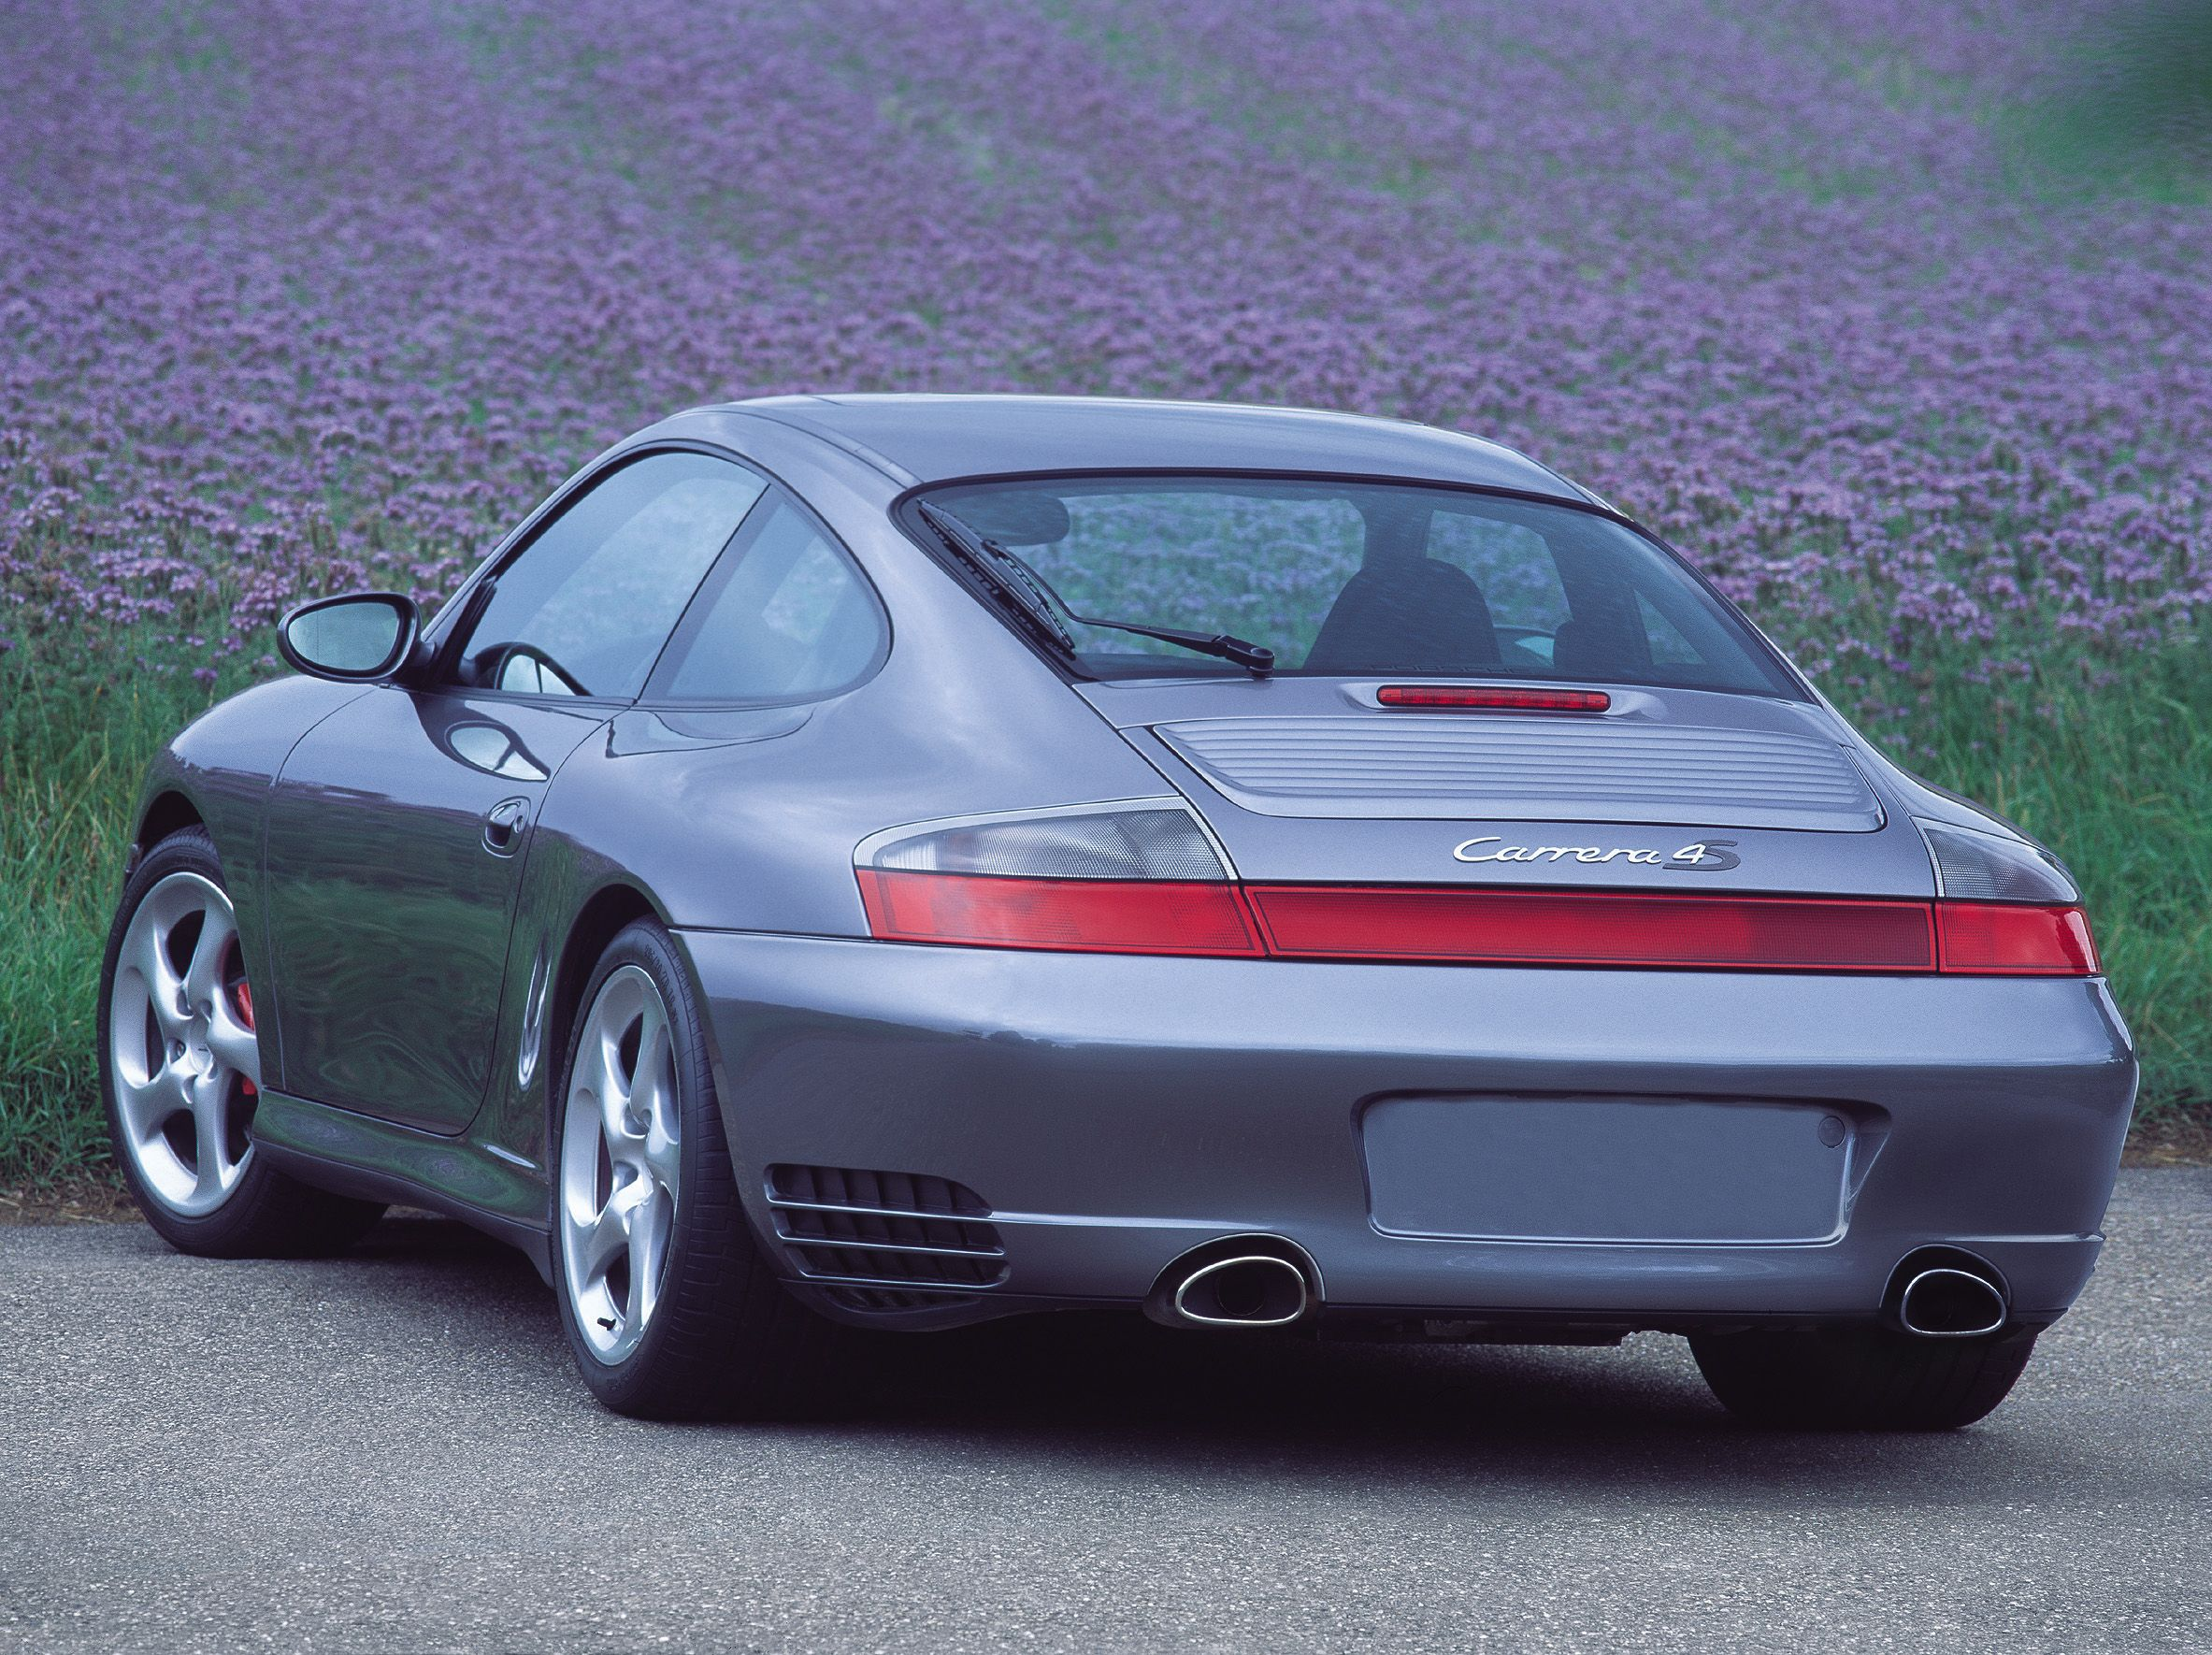 Porsche Carrera 4s 996 Porsche Porsche 911 Carrera 4s Porsche 911 Porsche Parts